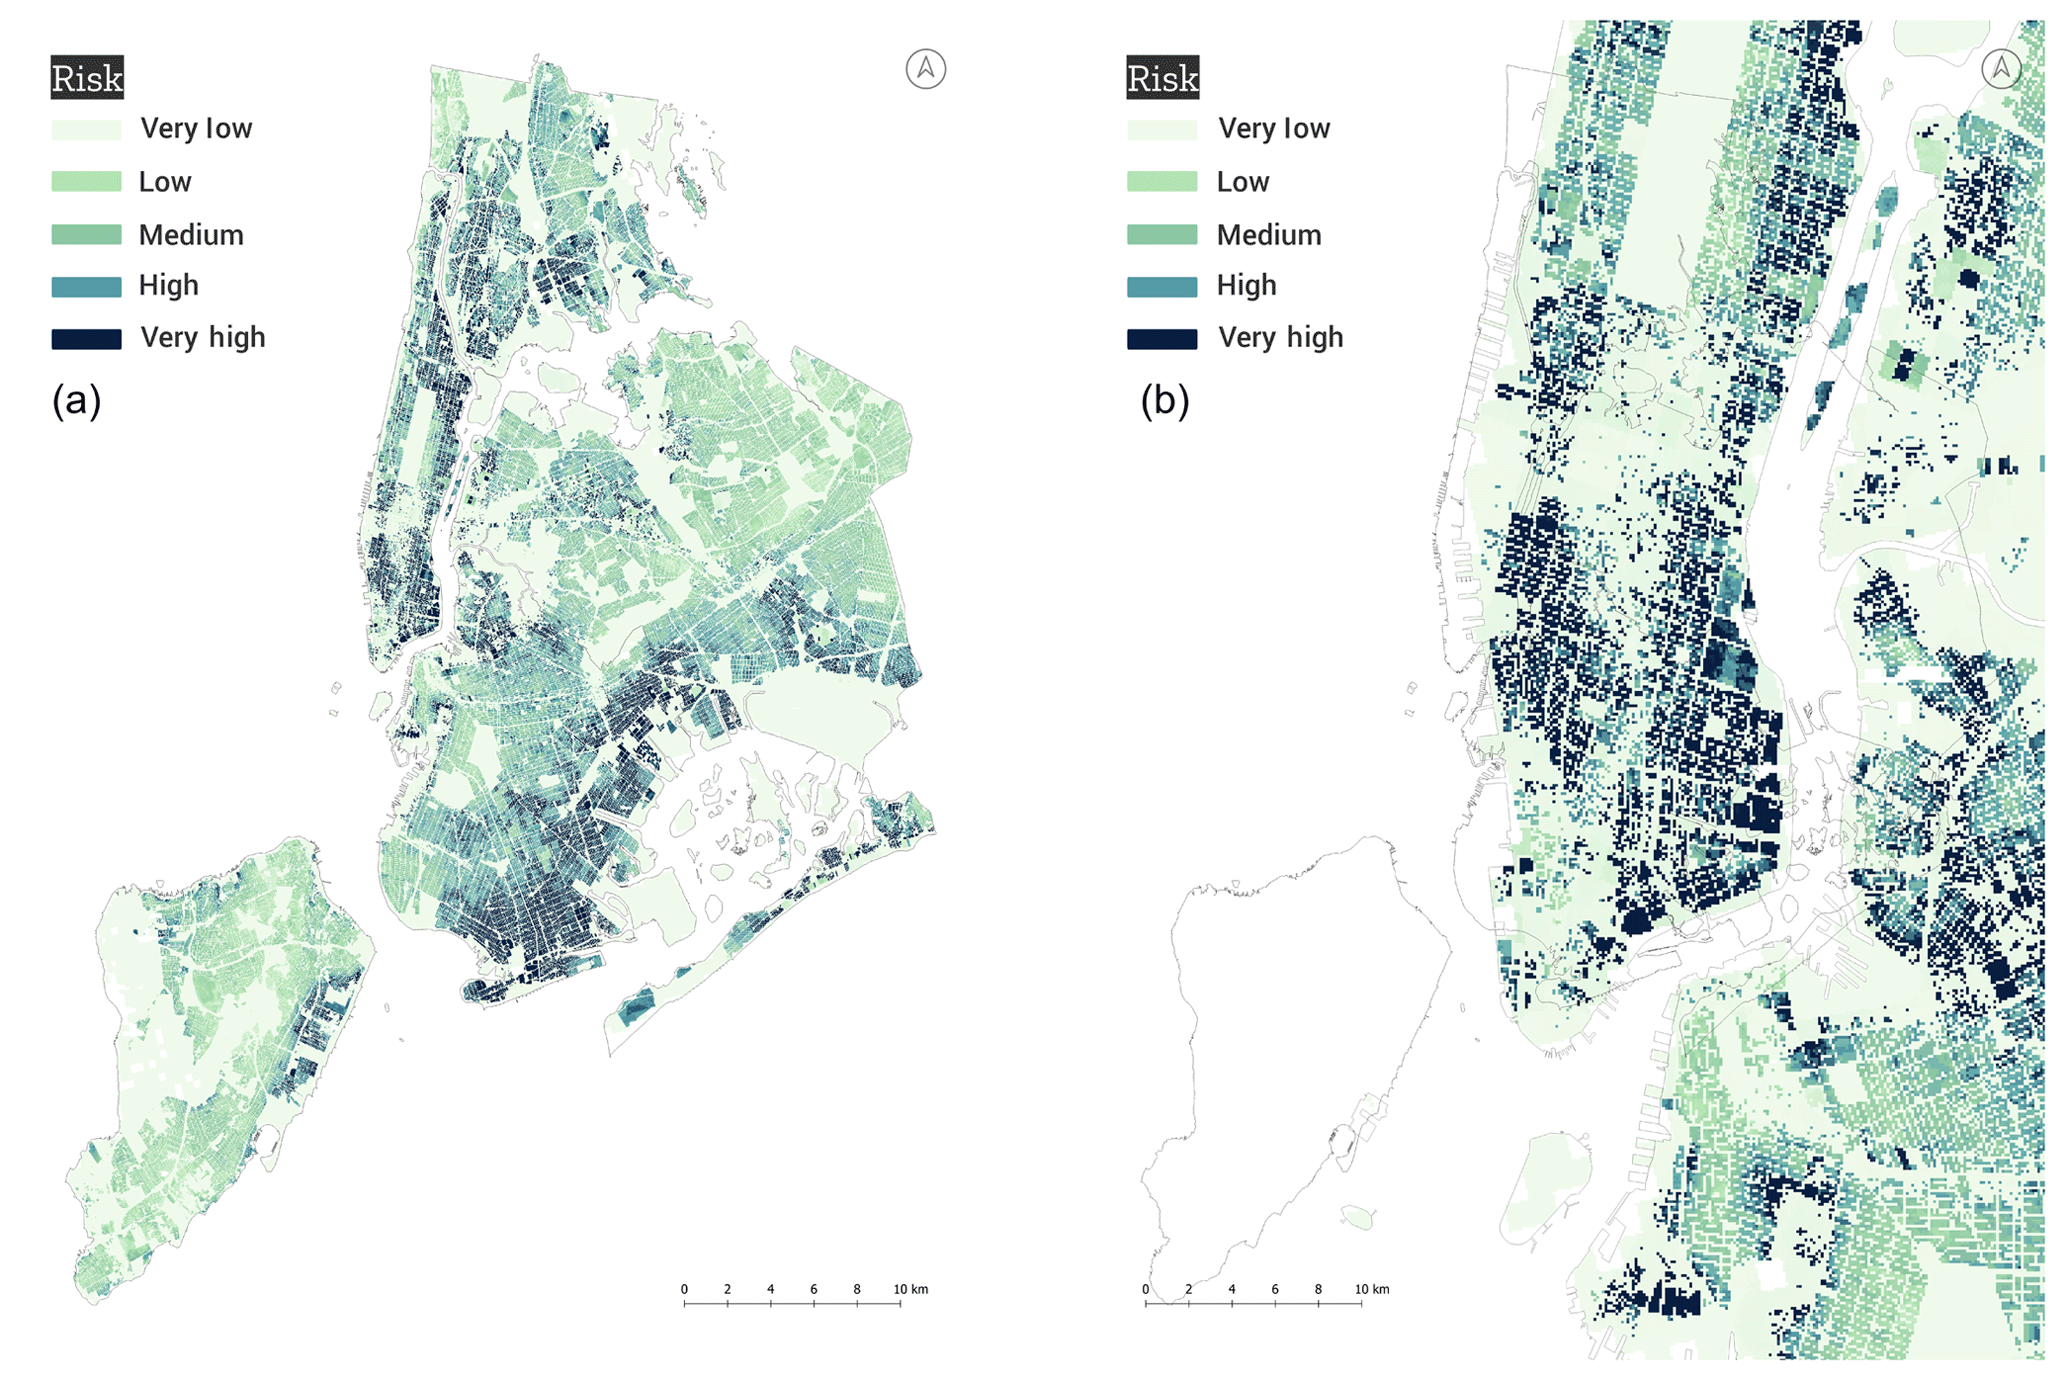 NHESS - Multi-hazard risks in New York City